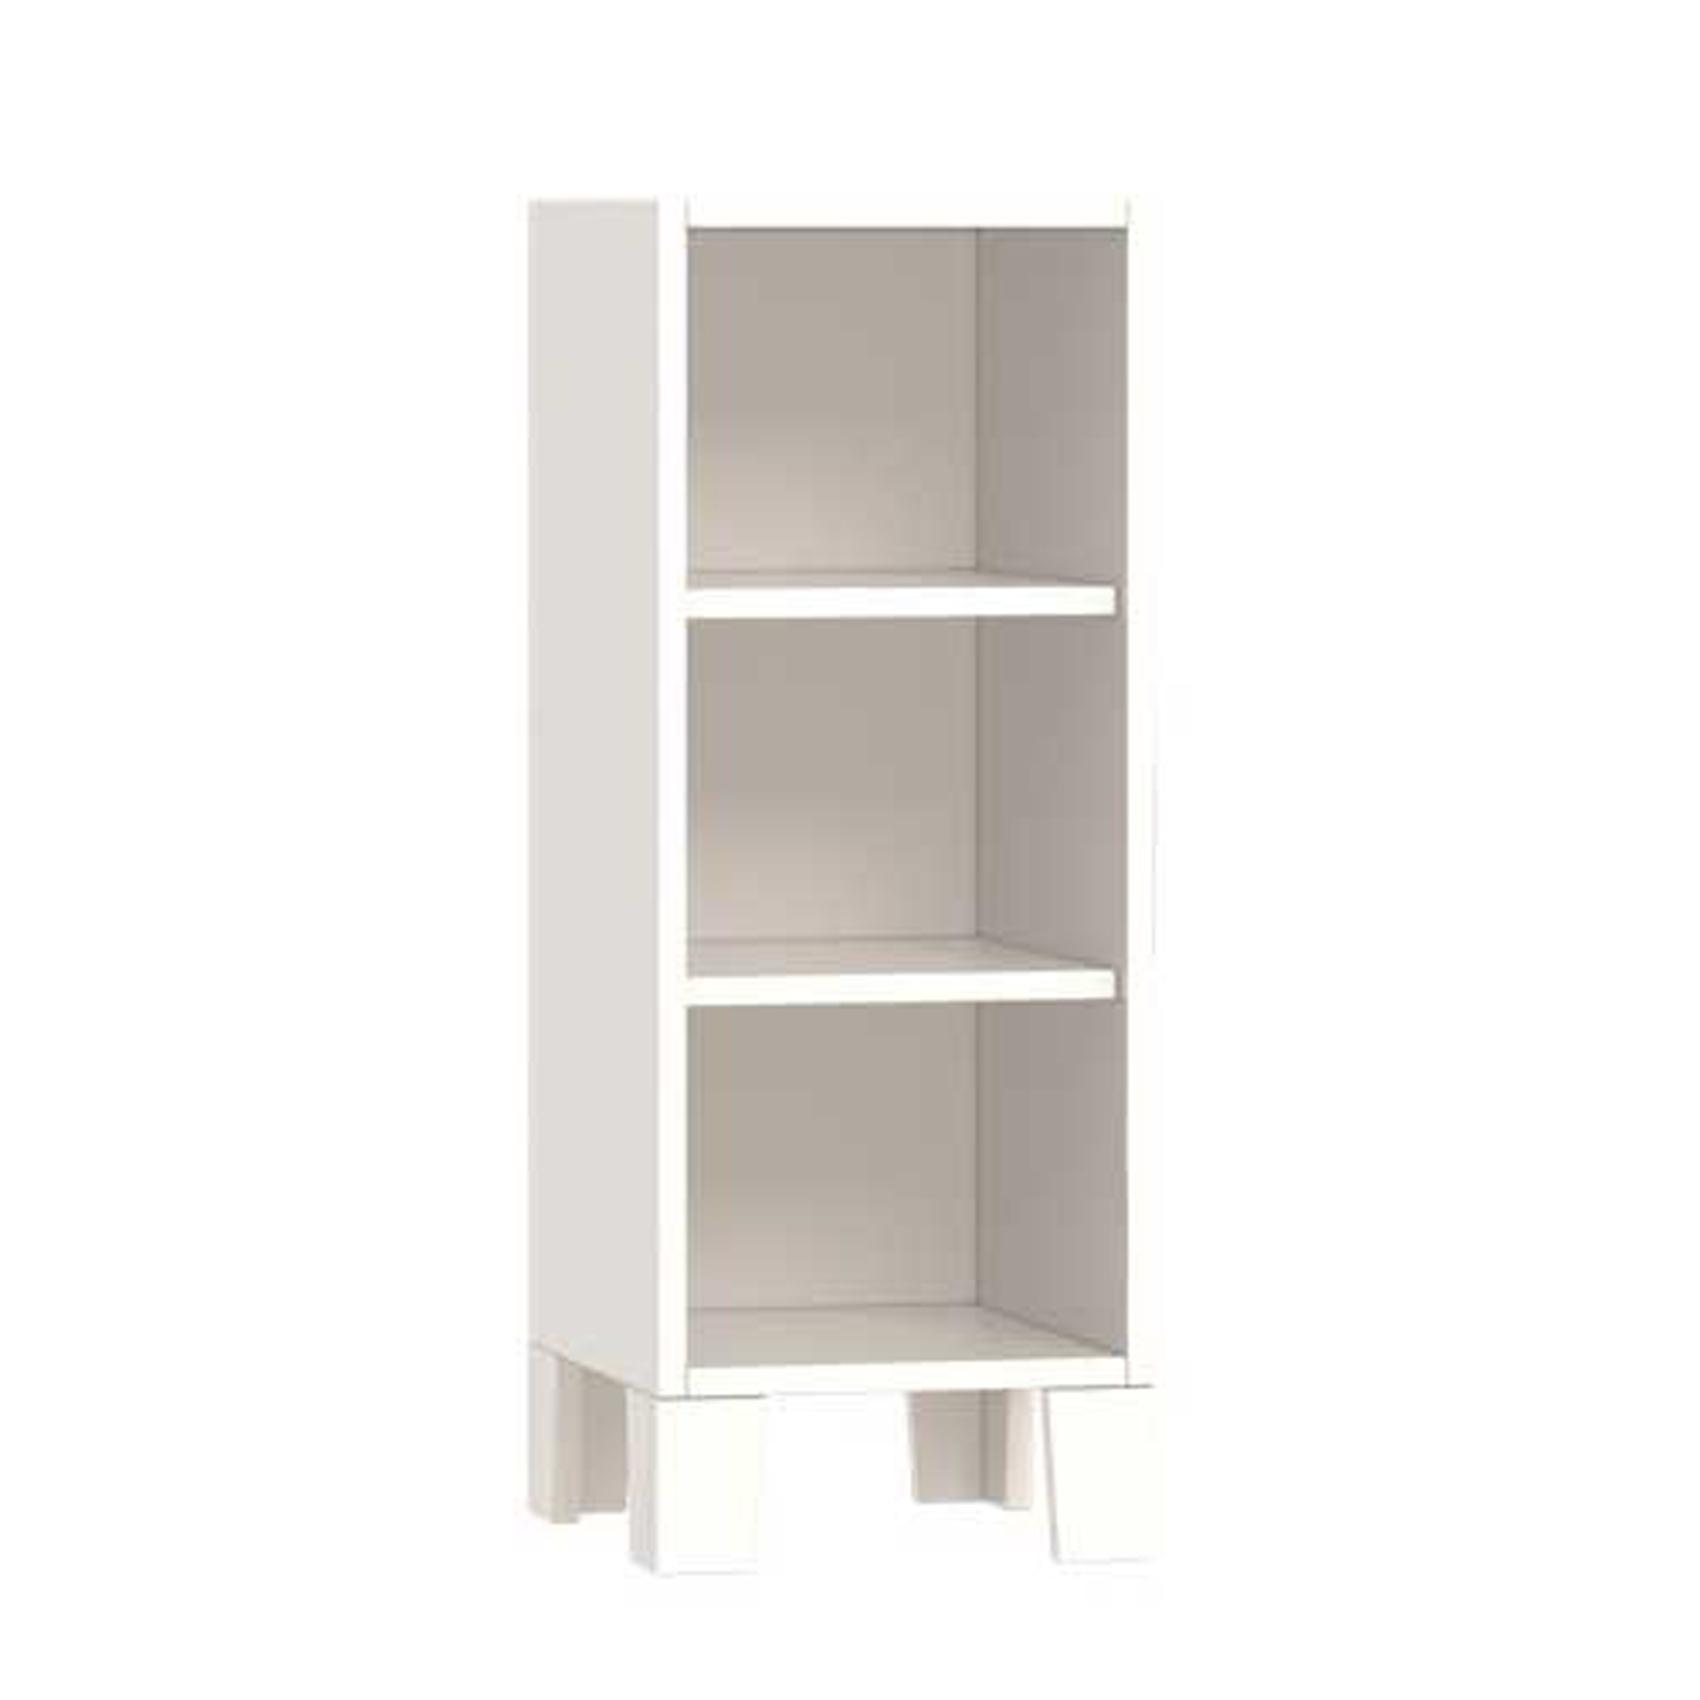 Etagère 3 niches enfant bora en bois Blanc 32x36x85